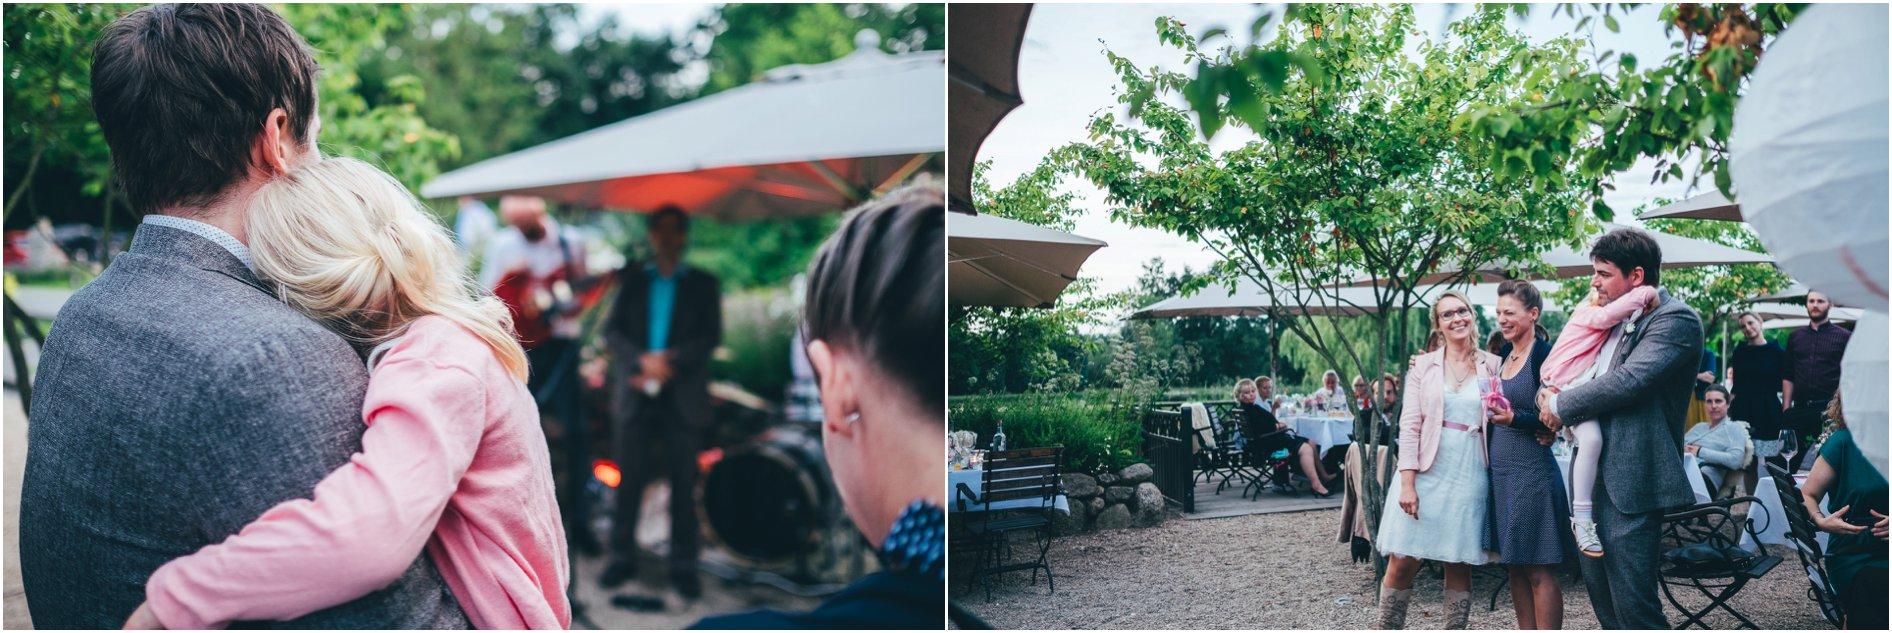 2016-04-19_0099 Sandra & Janis - Hochzeitsfotograf in Seevetal